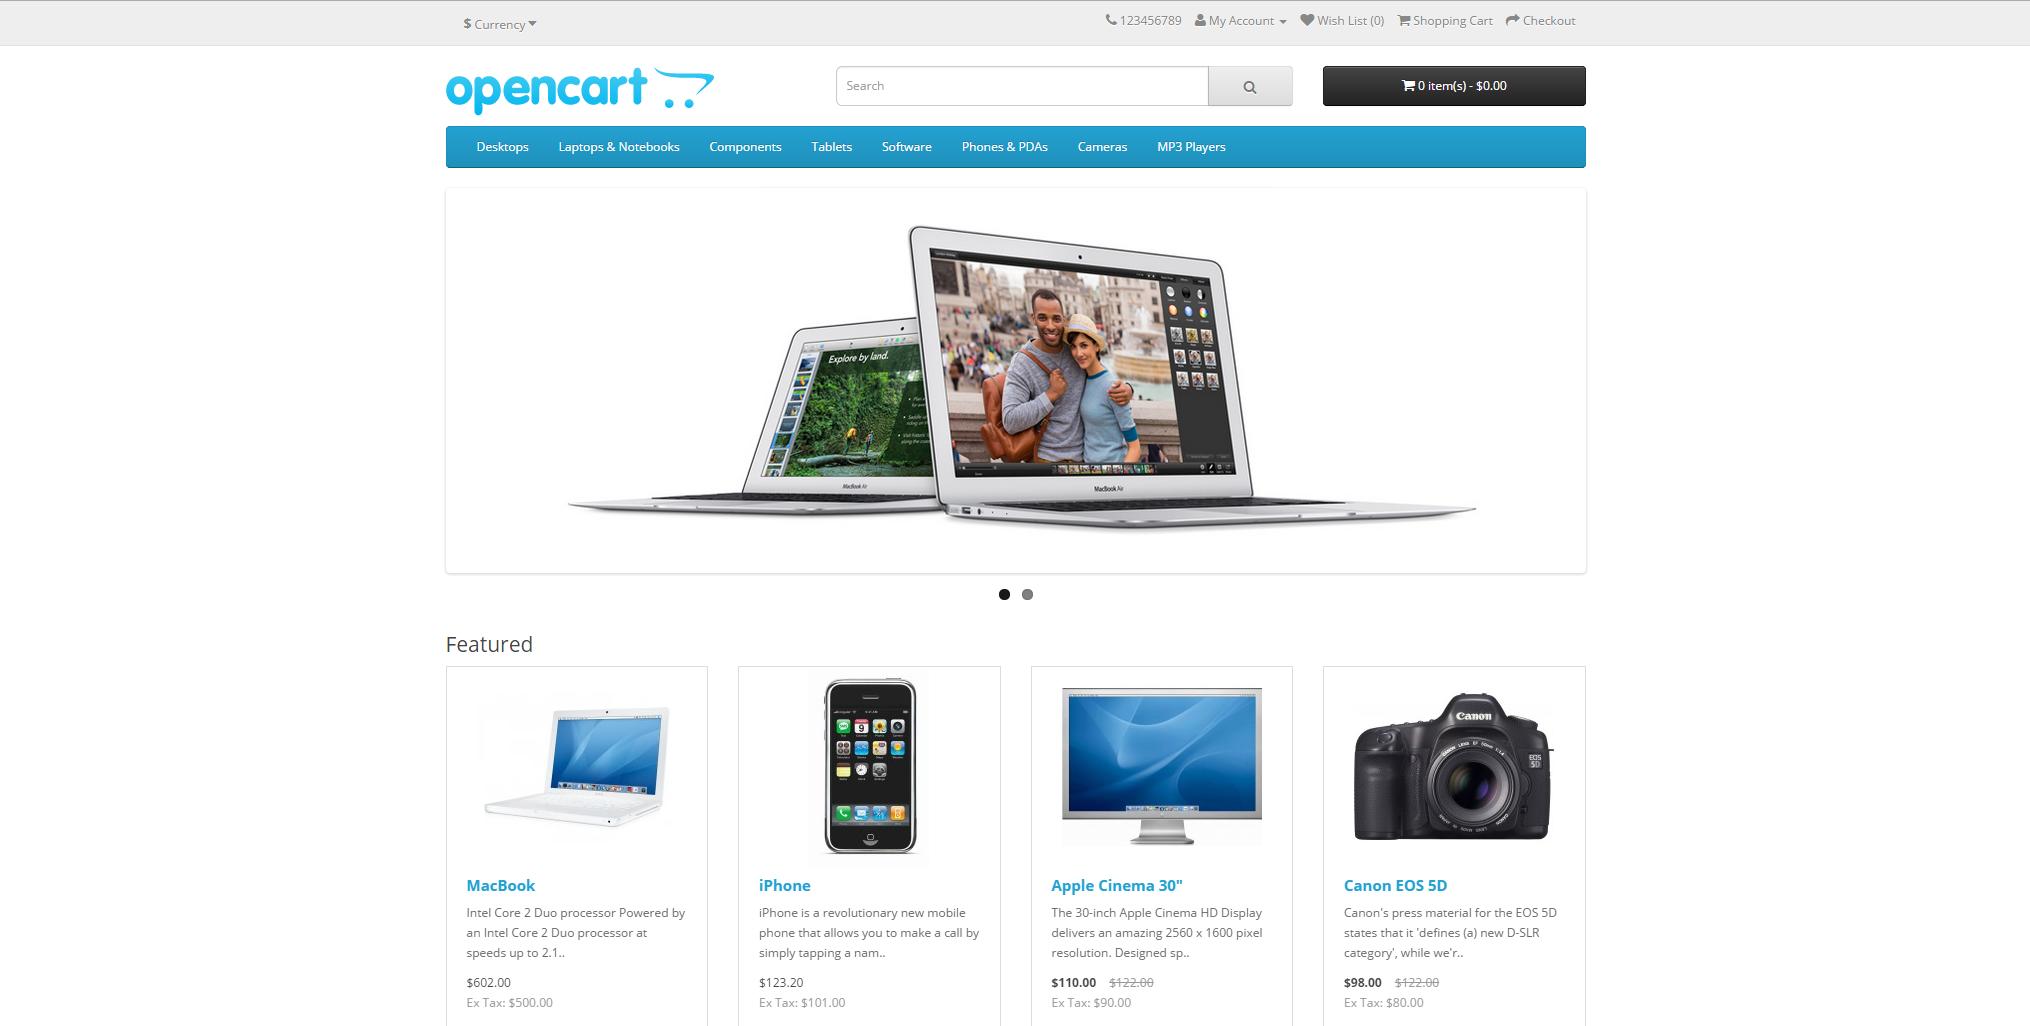 OpenCart 2.0